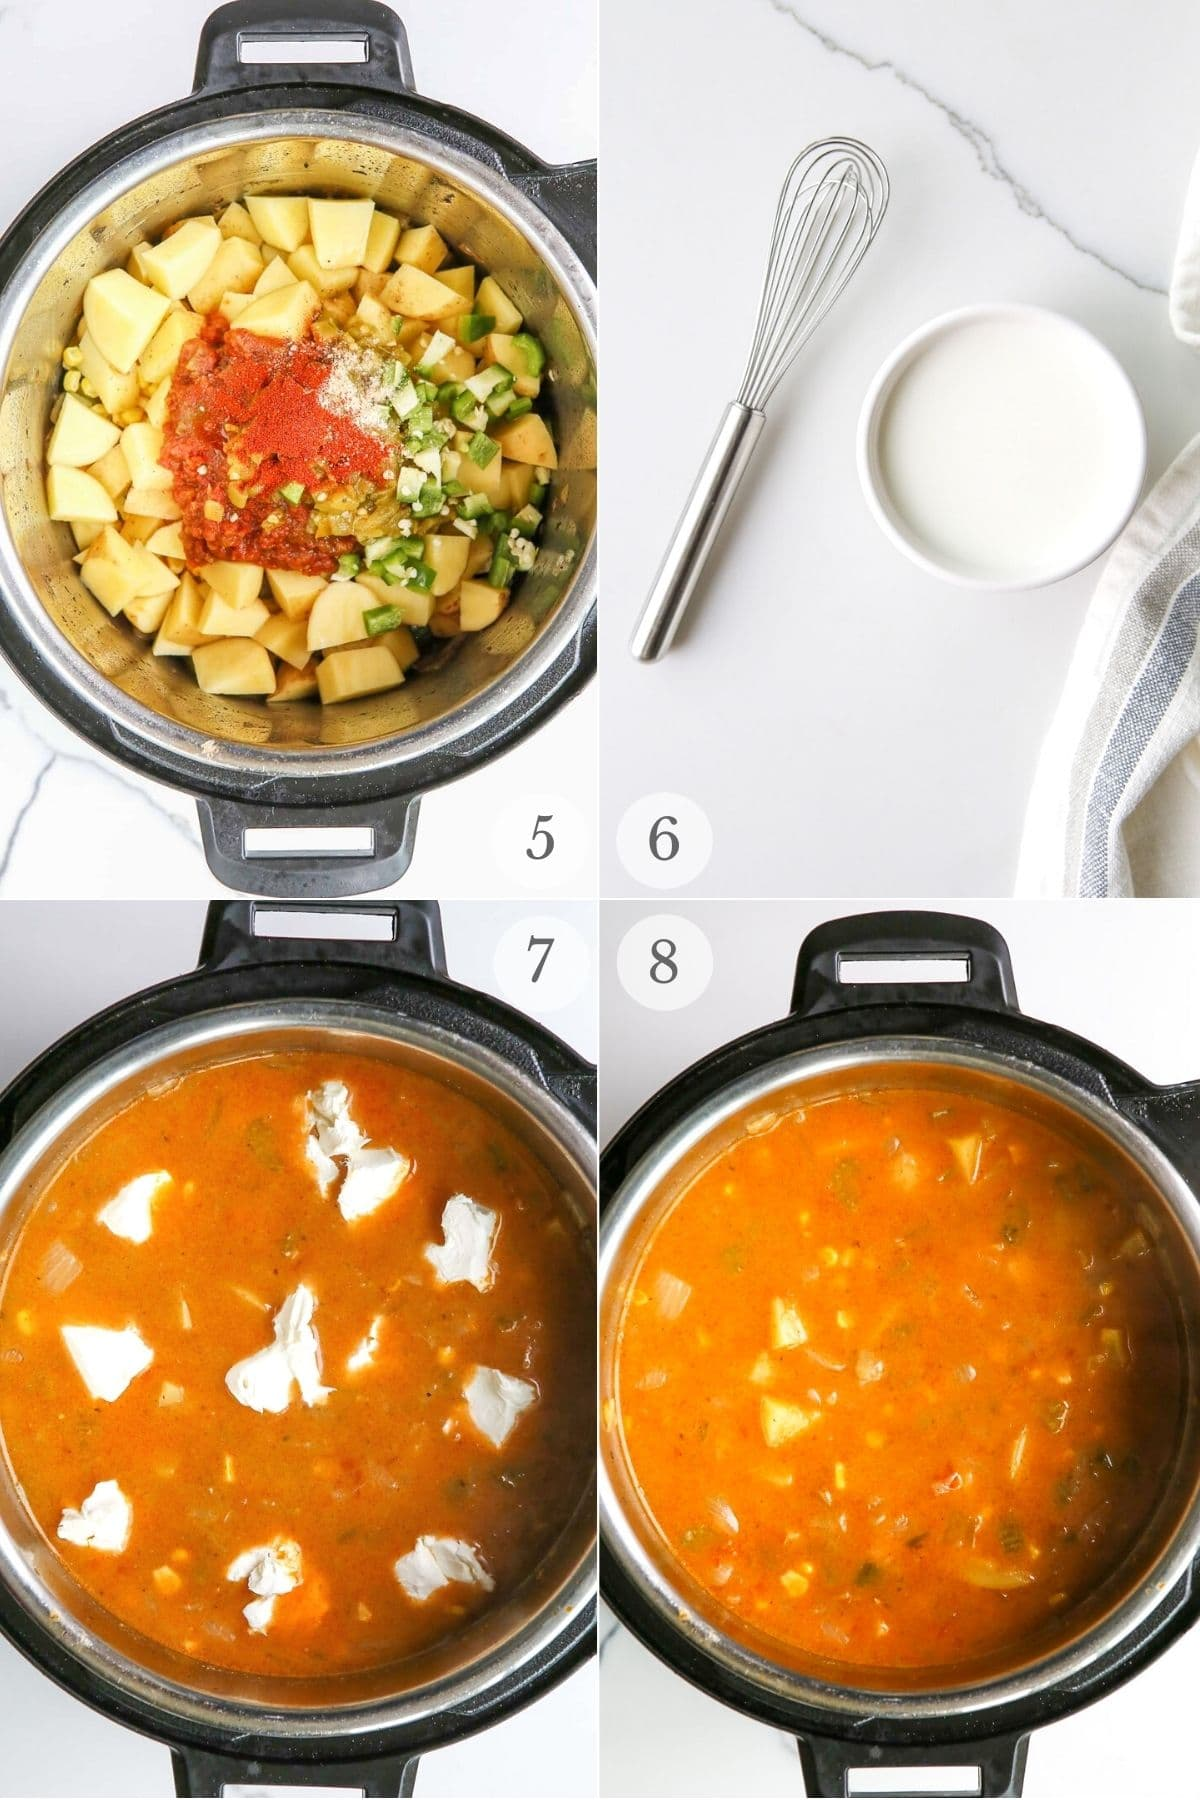 instant pot potato soup recipe steps 5-8